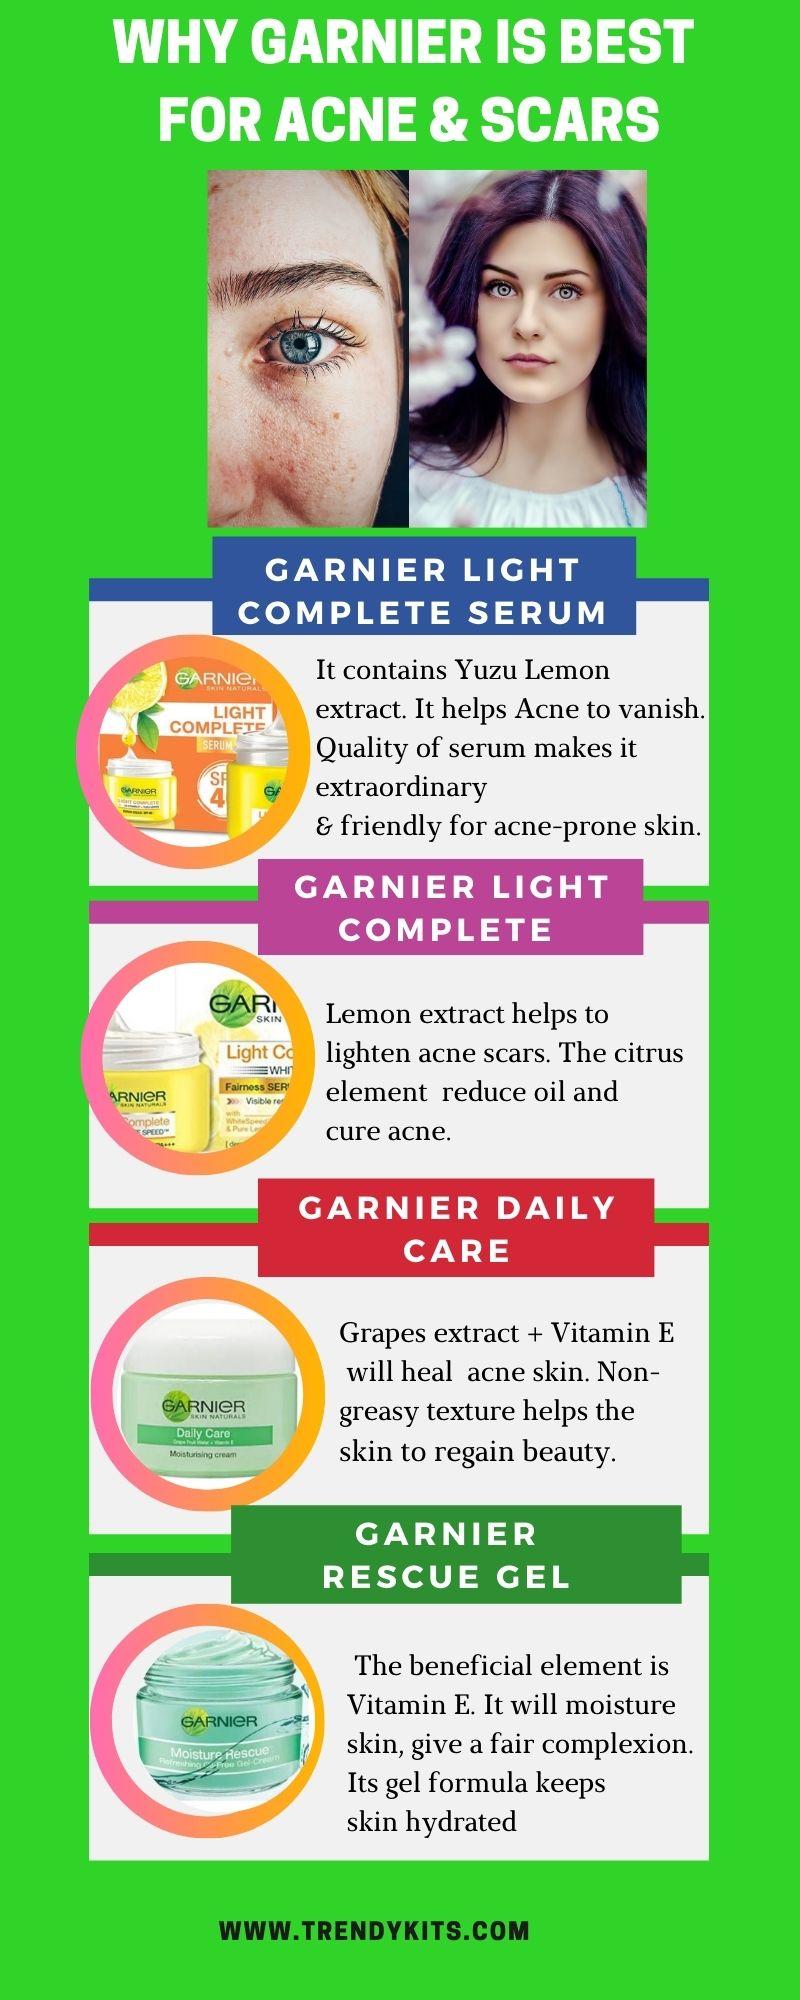 Garnier cream for acne